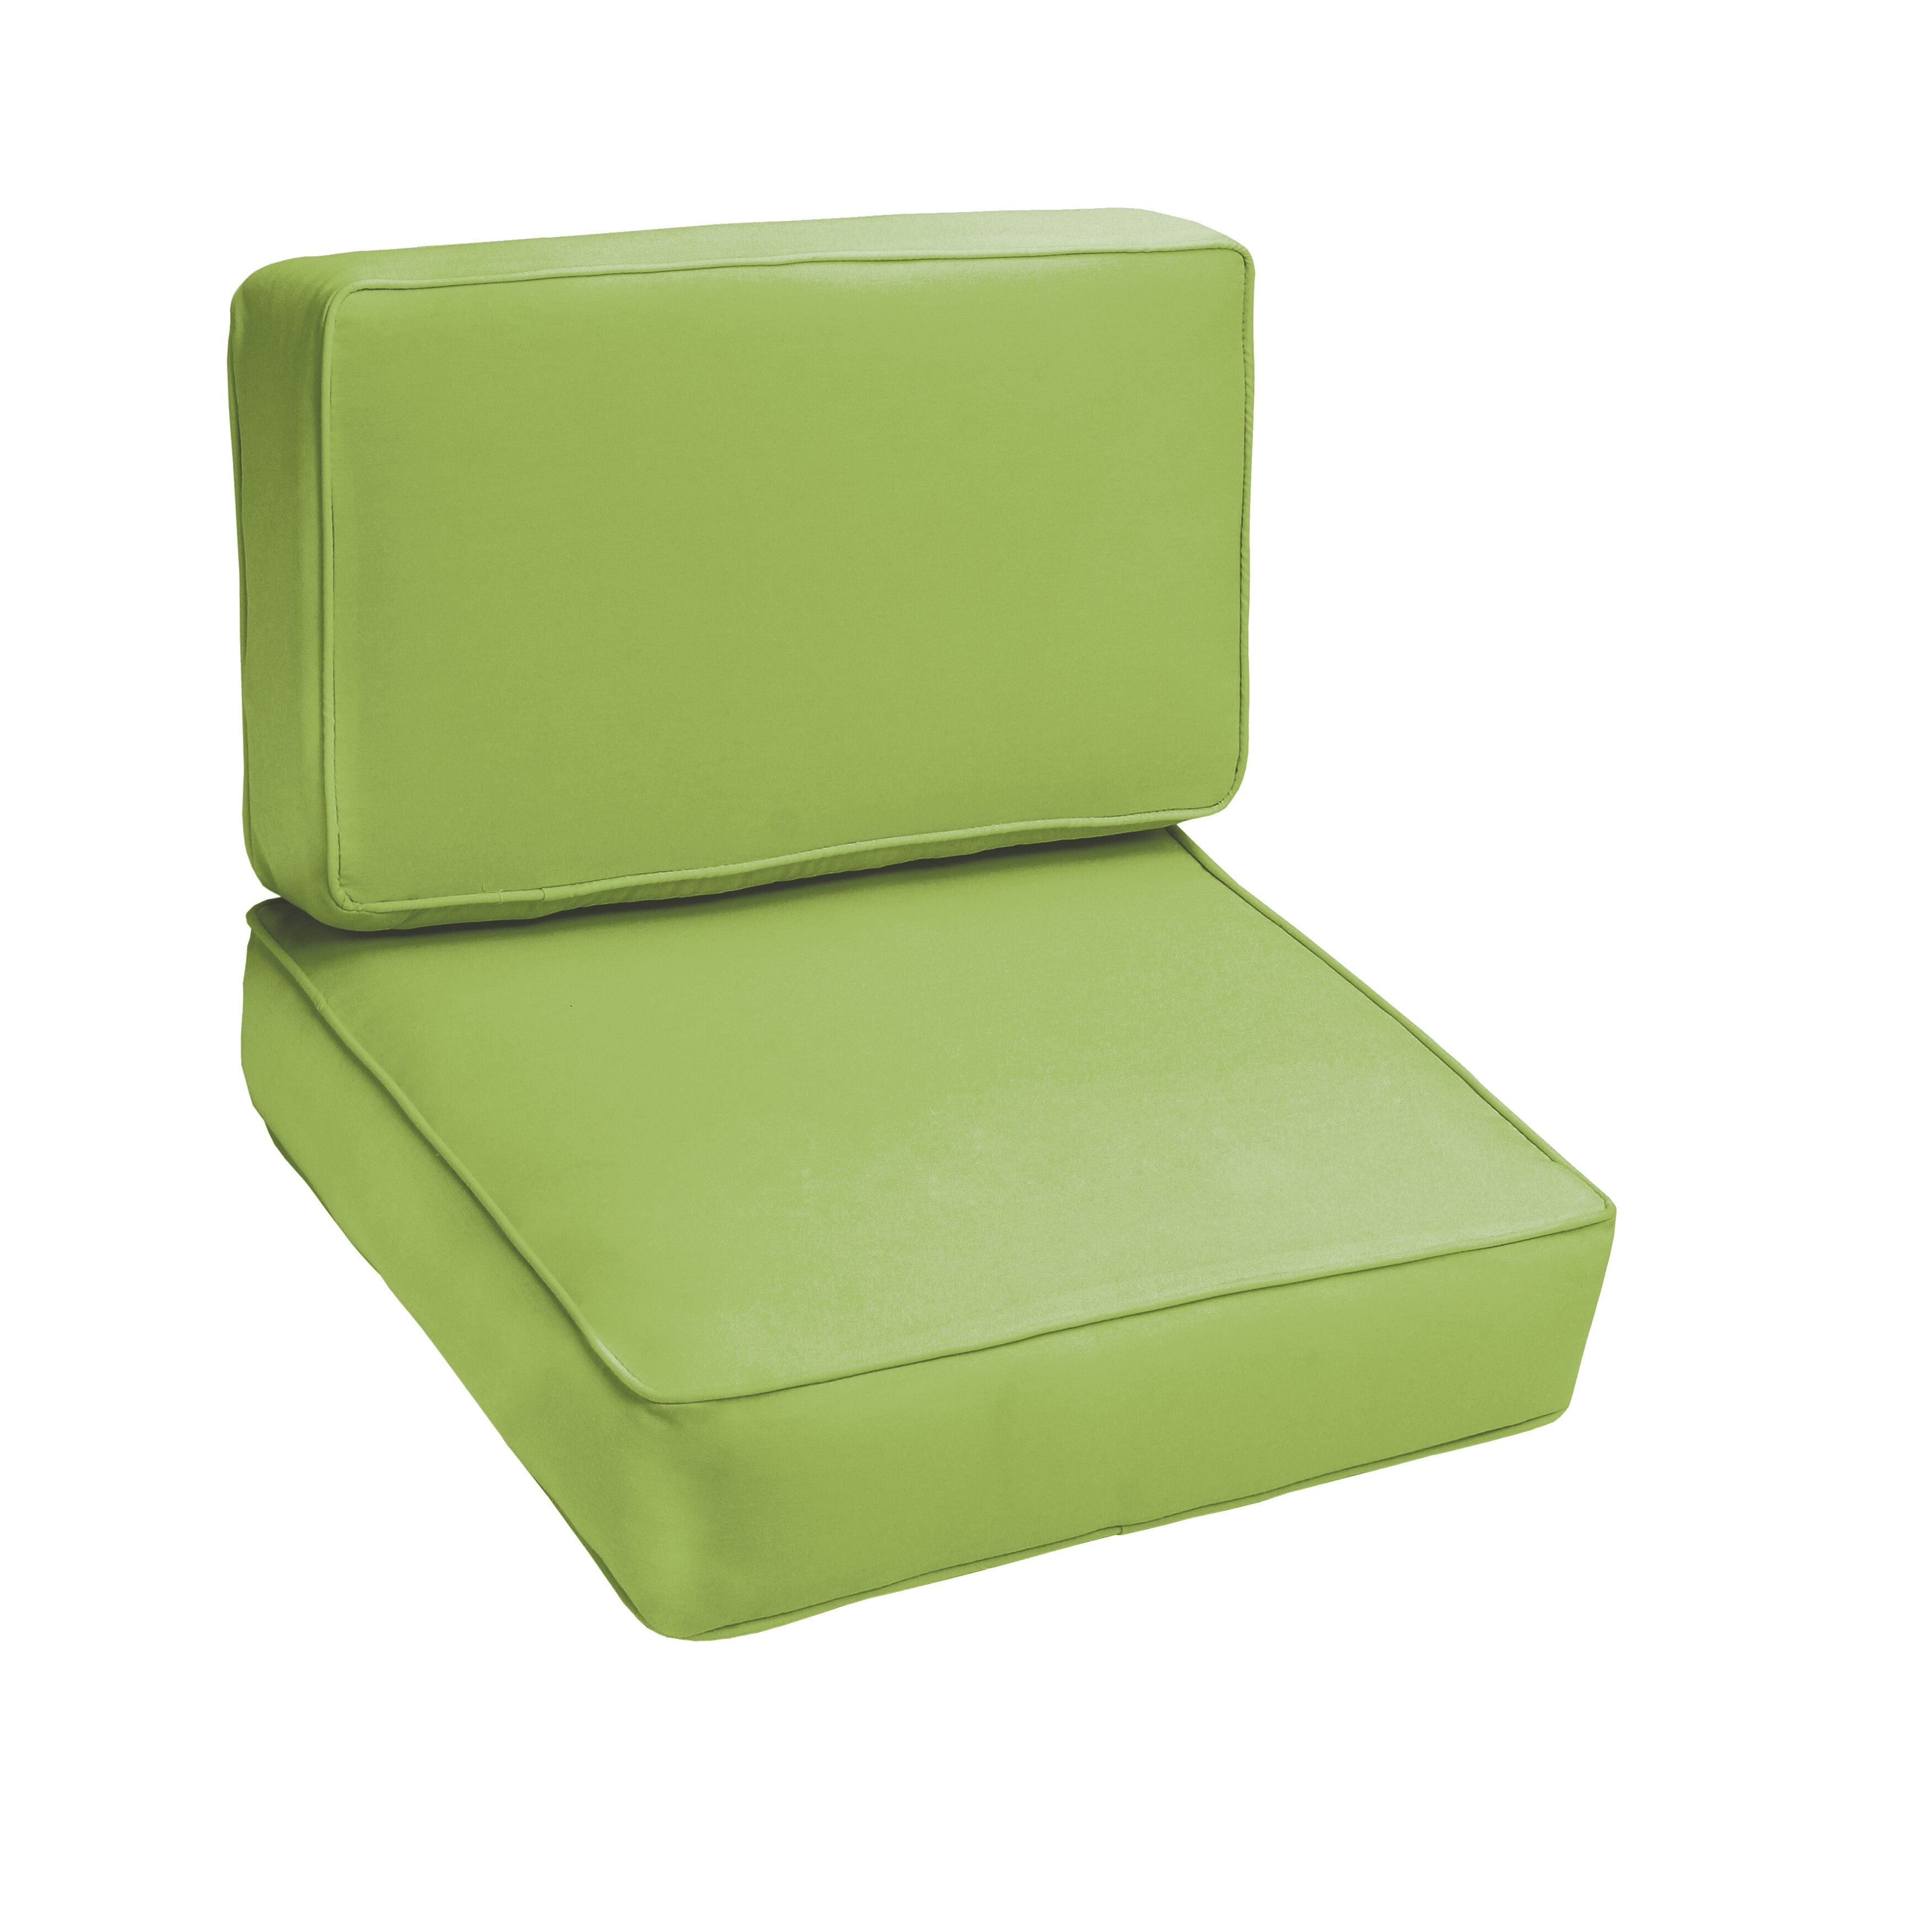 Selene outdoor sofa cushion wayfair